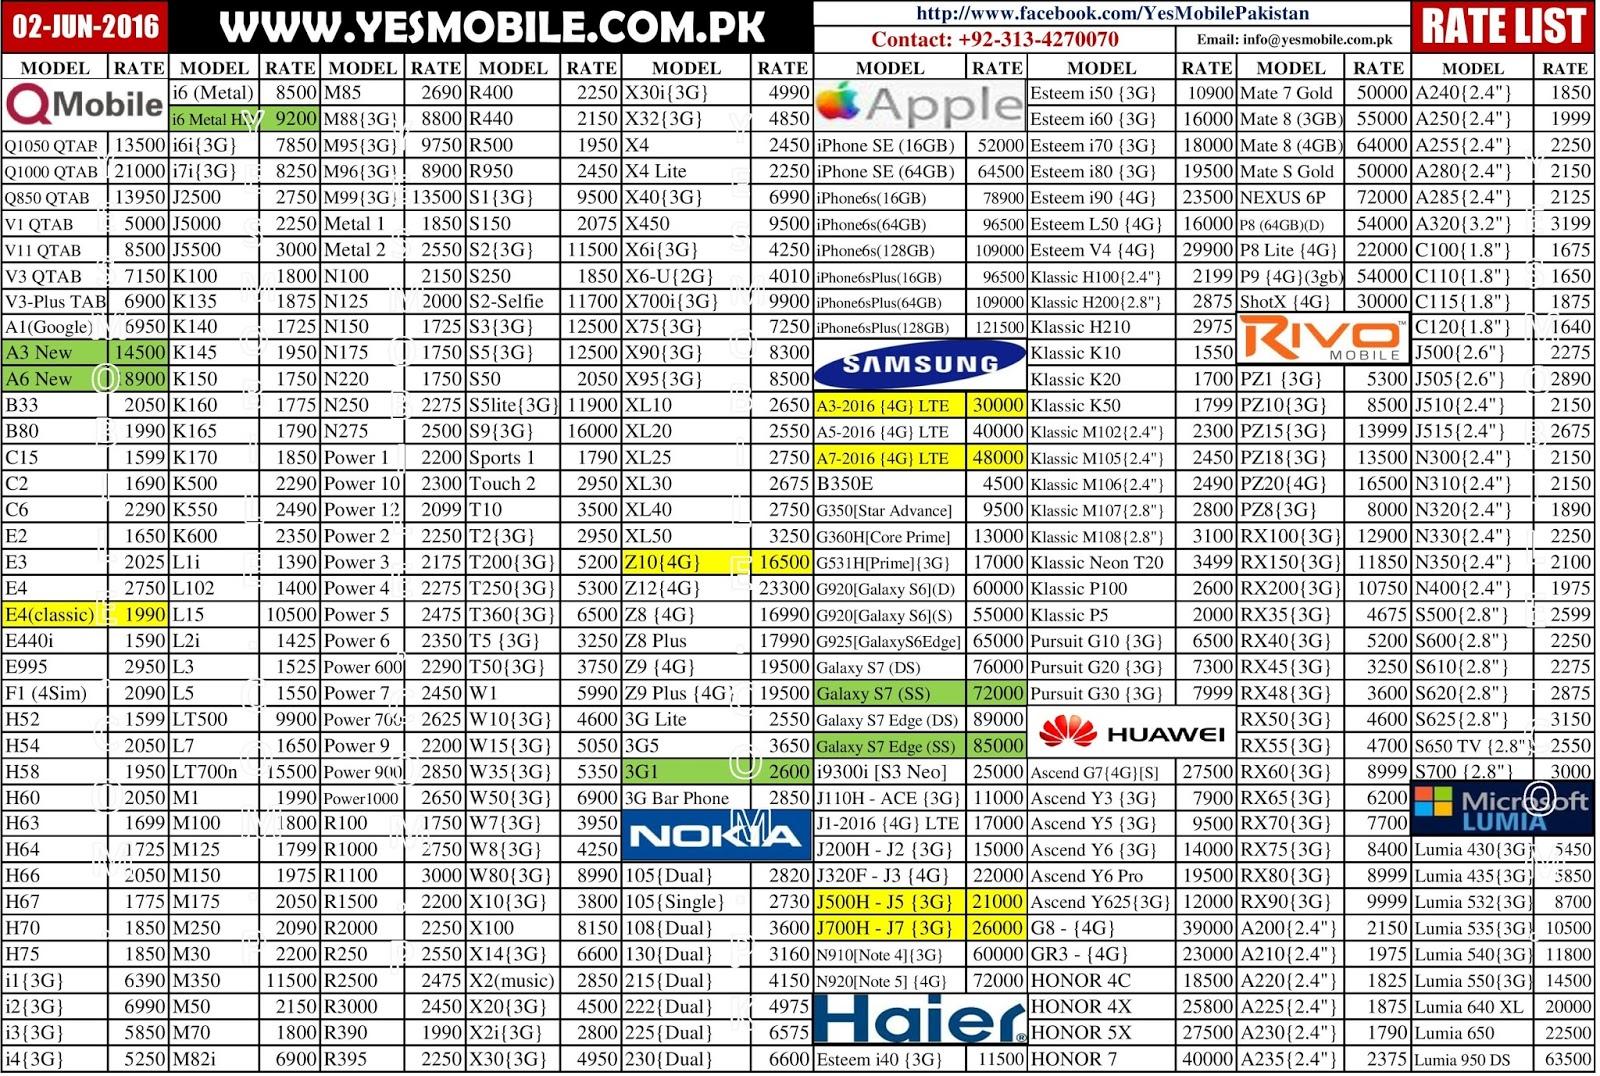 samsung phone price list 2016. mobile phones price list 2nd june 2016 - yes samsung phone s